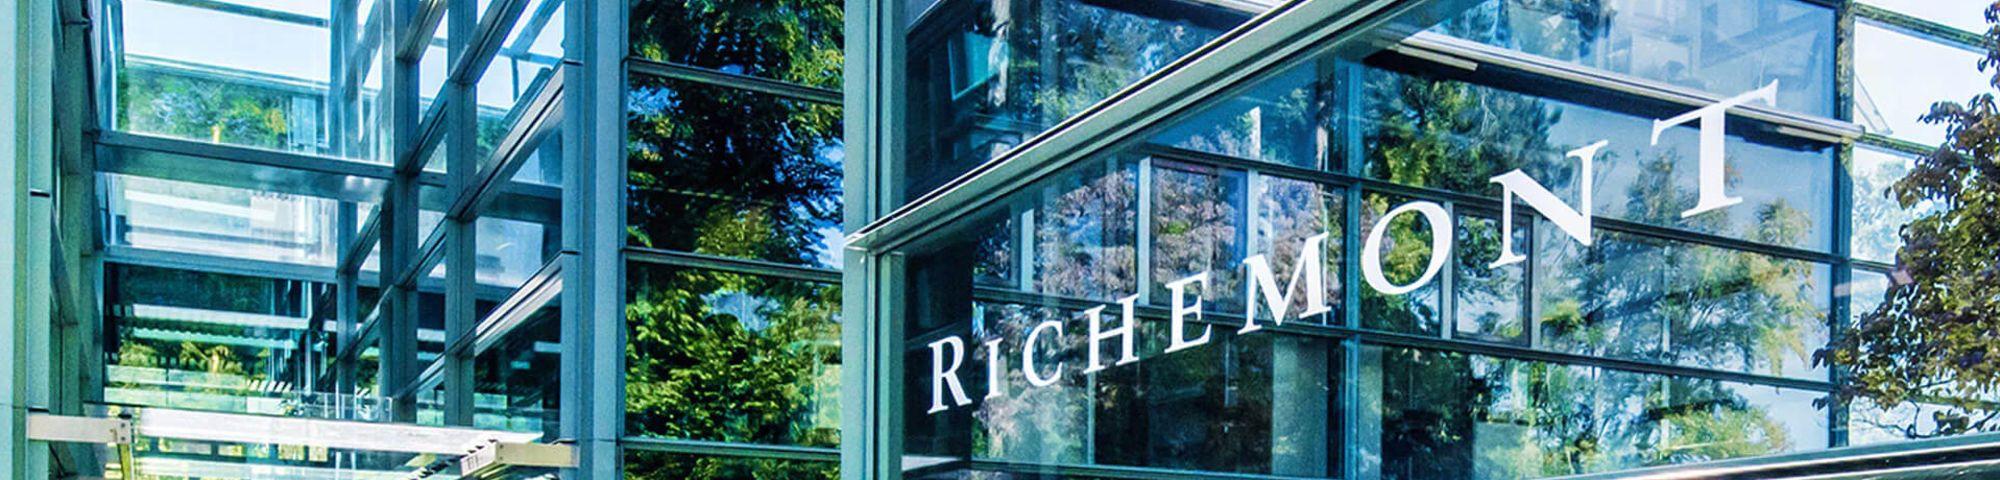 Richemont's headquarters in Geneva